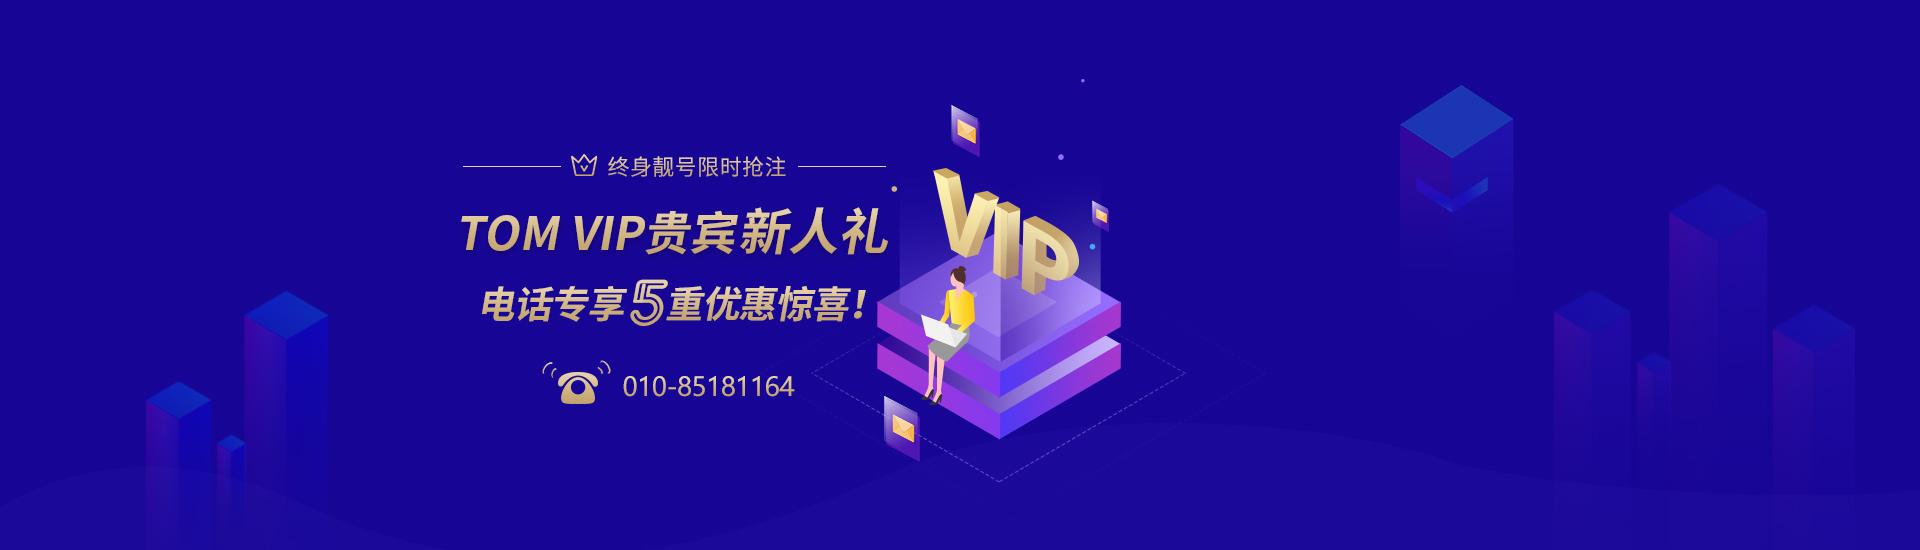 tom杏耀登陆注册-vip杏耀登陆注册